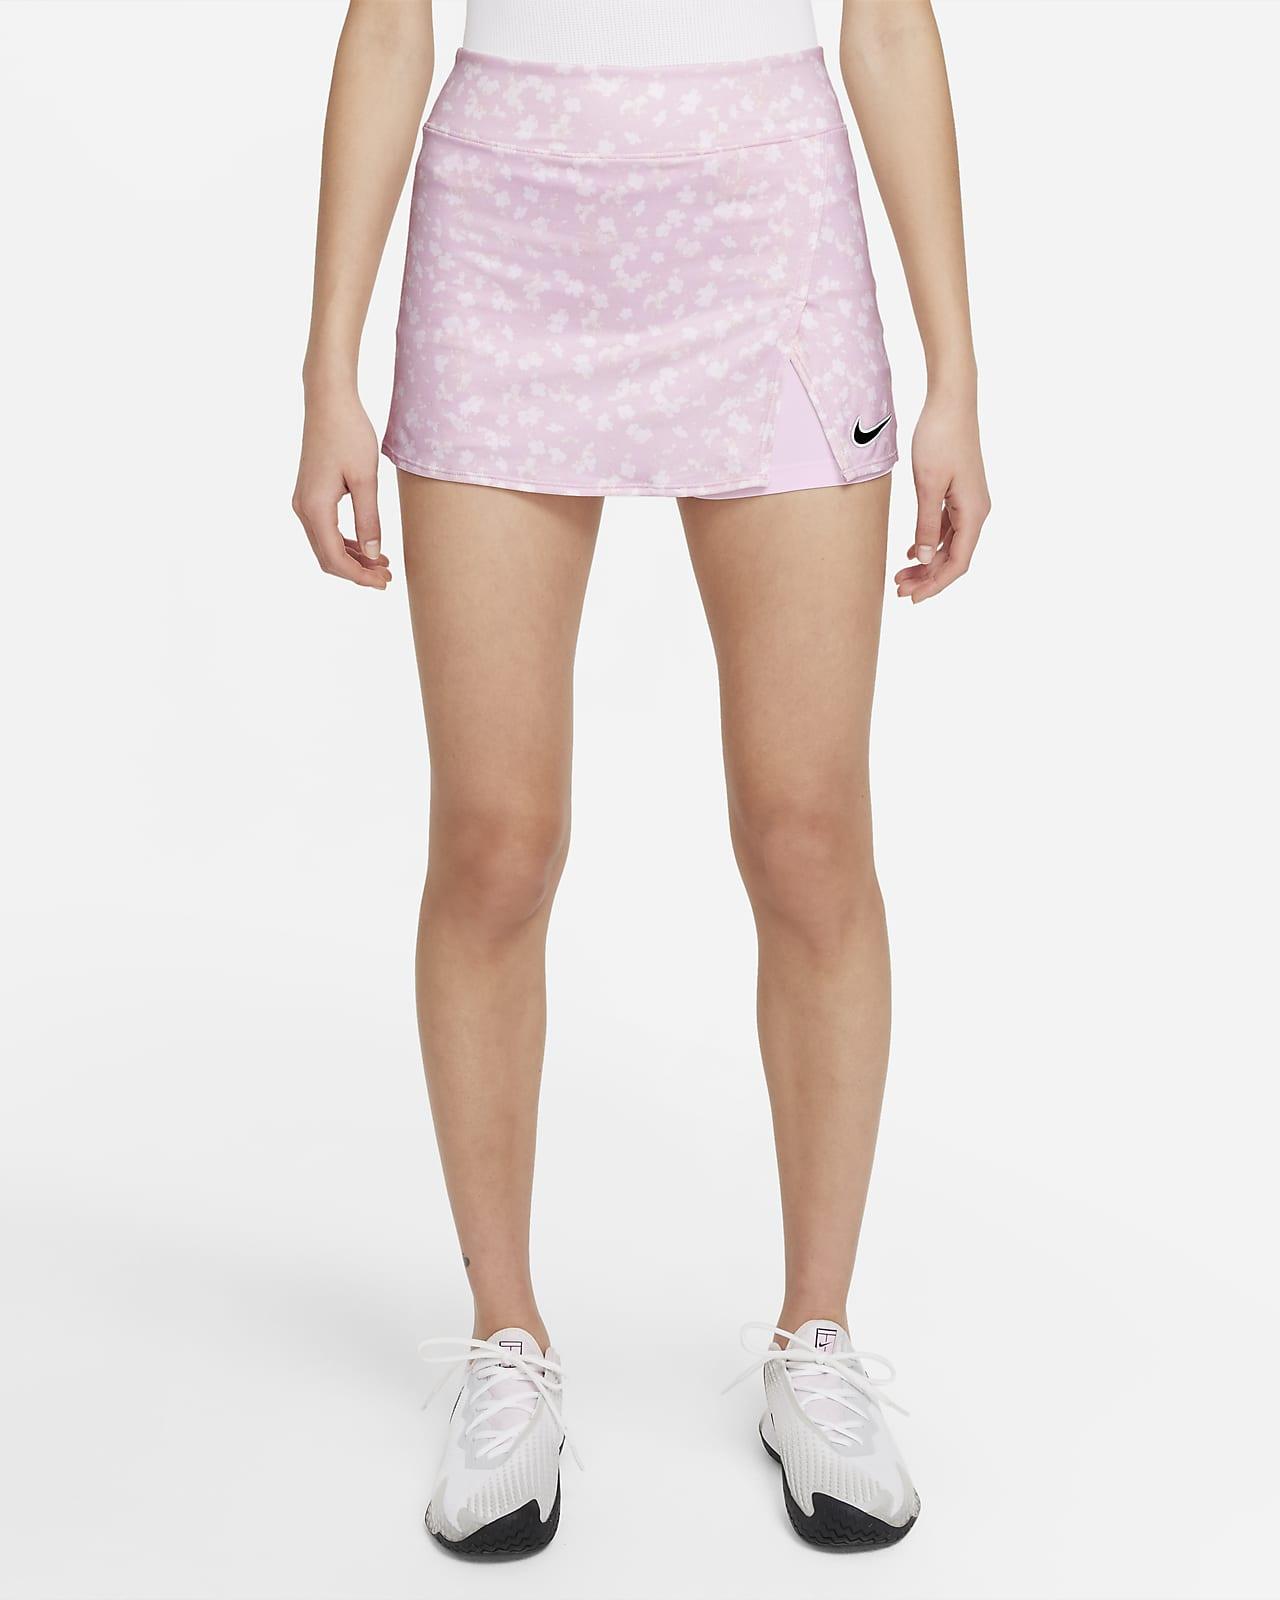 NikeCourt Dri-FIT Victory Women's Printed Tennis Skirt